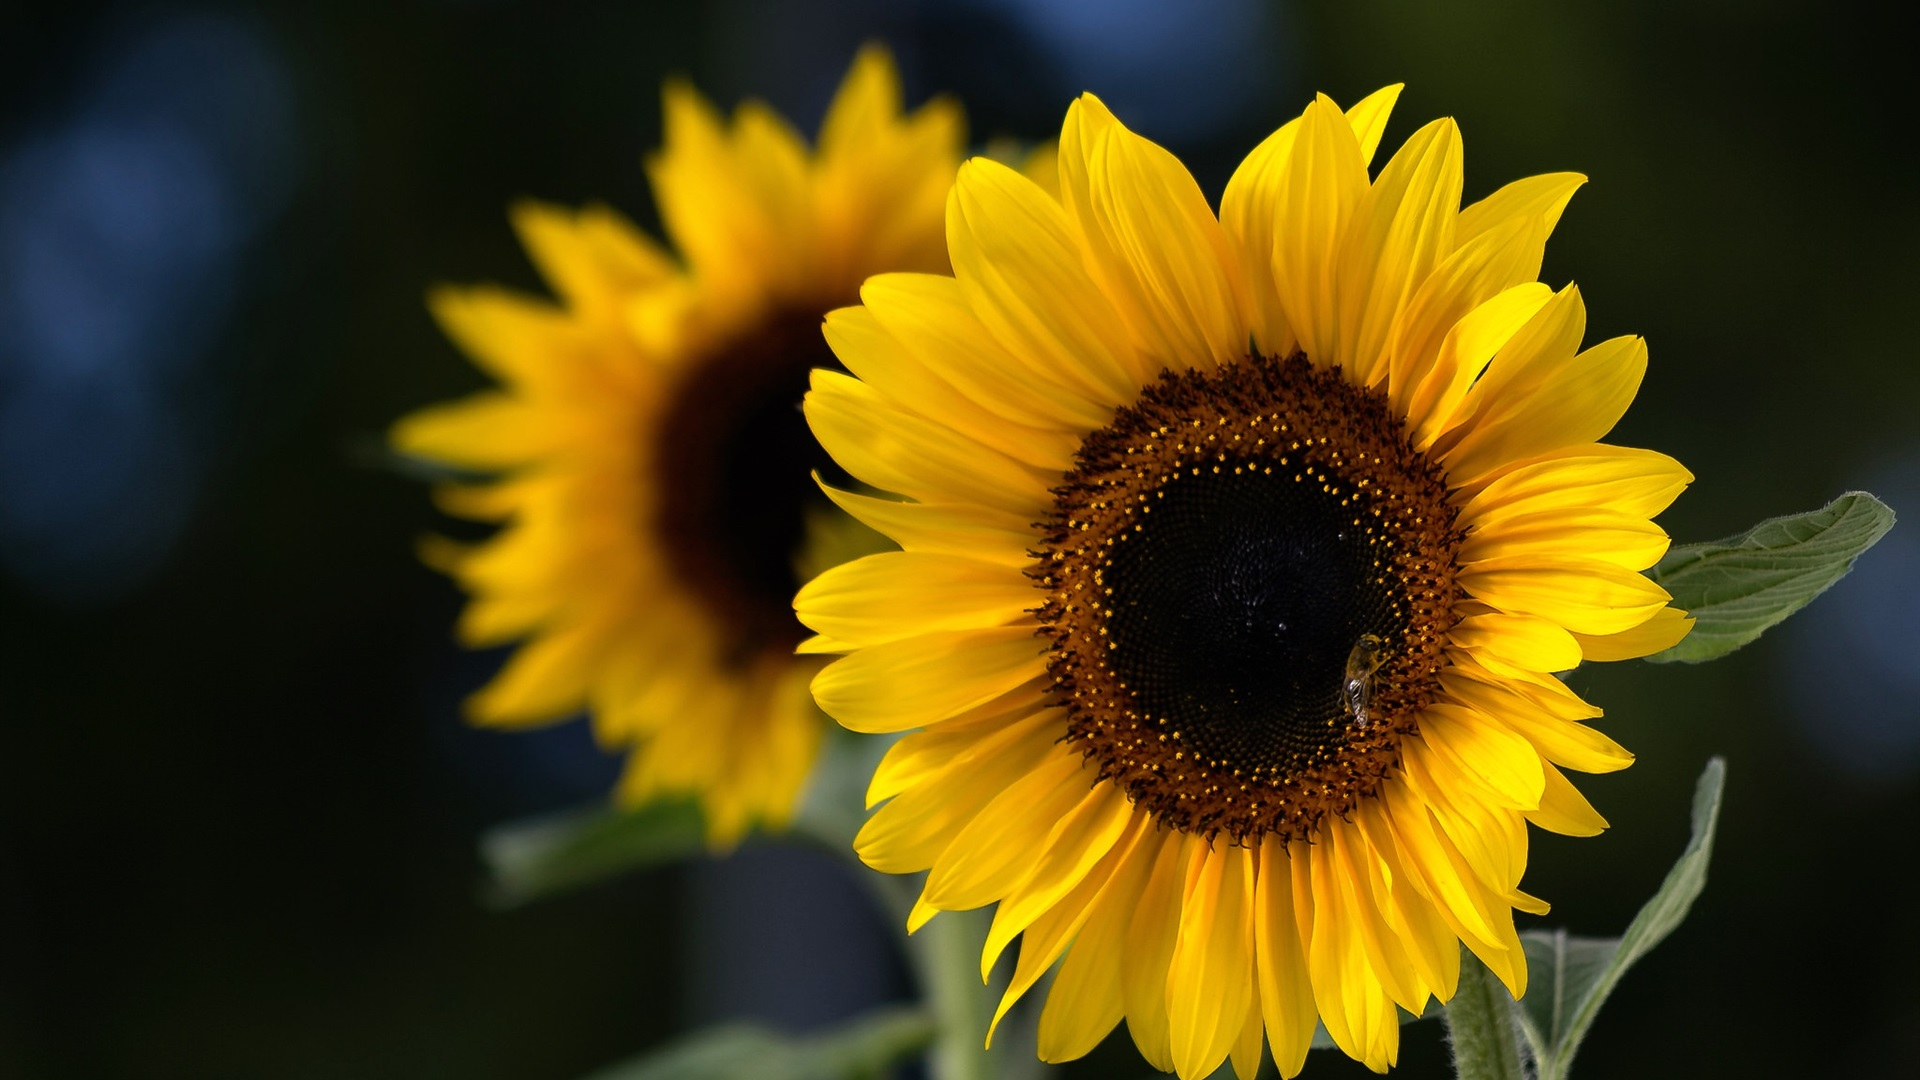 Imagenes De Fondo Flores Para Pantalla Hd 2: Fondos De Pantalla Girasoles, Abeja, Verano 1920x1200 HD